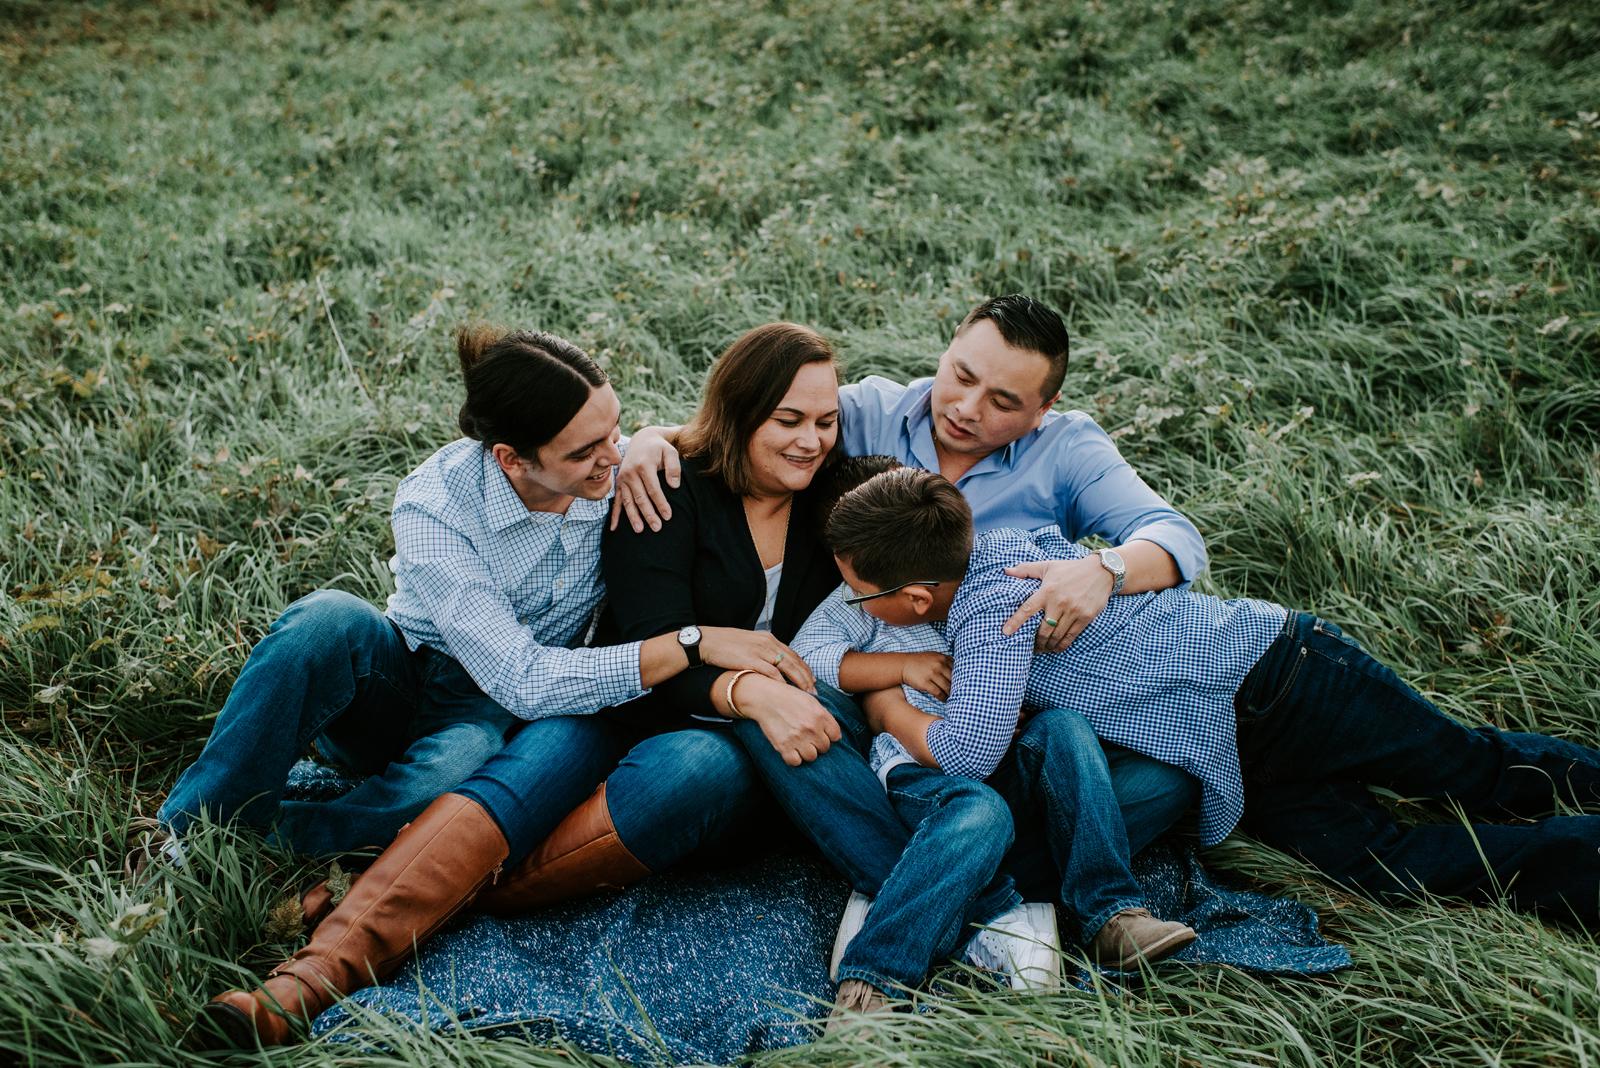 northernvafamilyphotographer.jpg